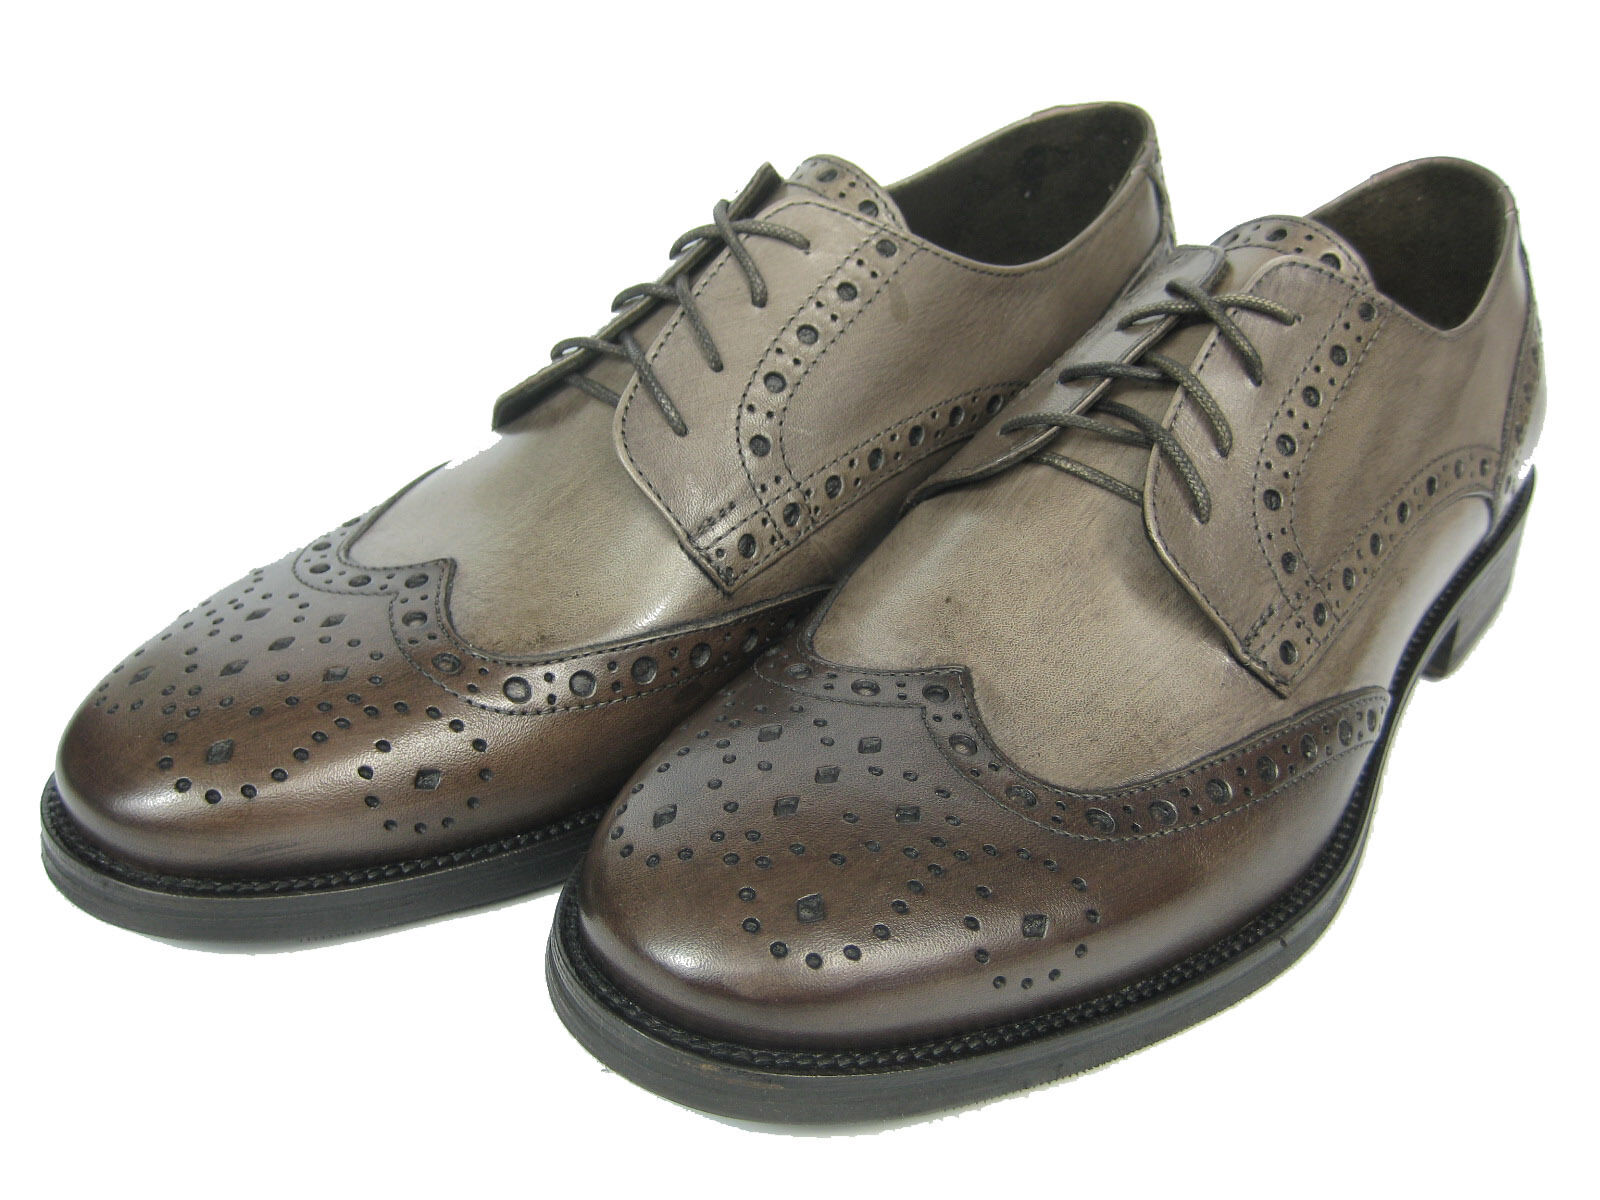 GIORGIO SCARPE Derby & Budapester Leder Schuh GM13 Handgenäht mokka & Derby hell braun 682d10